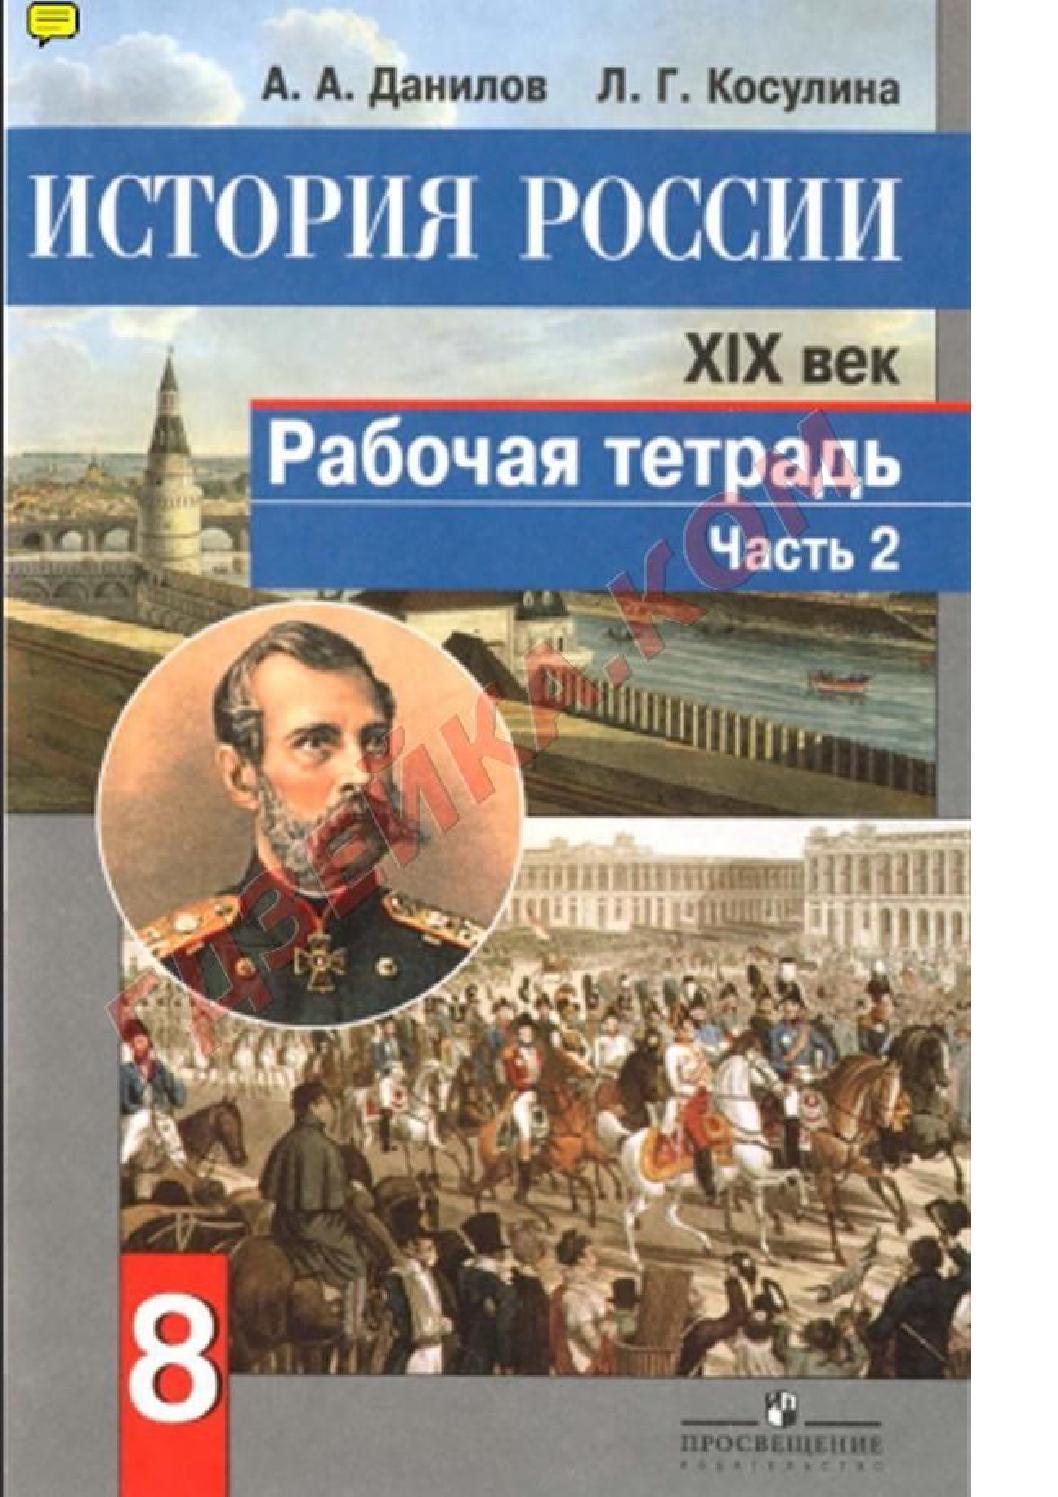 Учебник История России 6 класс АА Данилов ЛГ Косулина